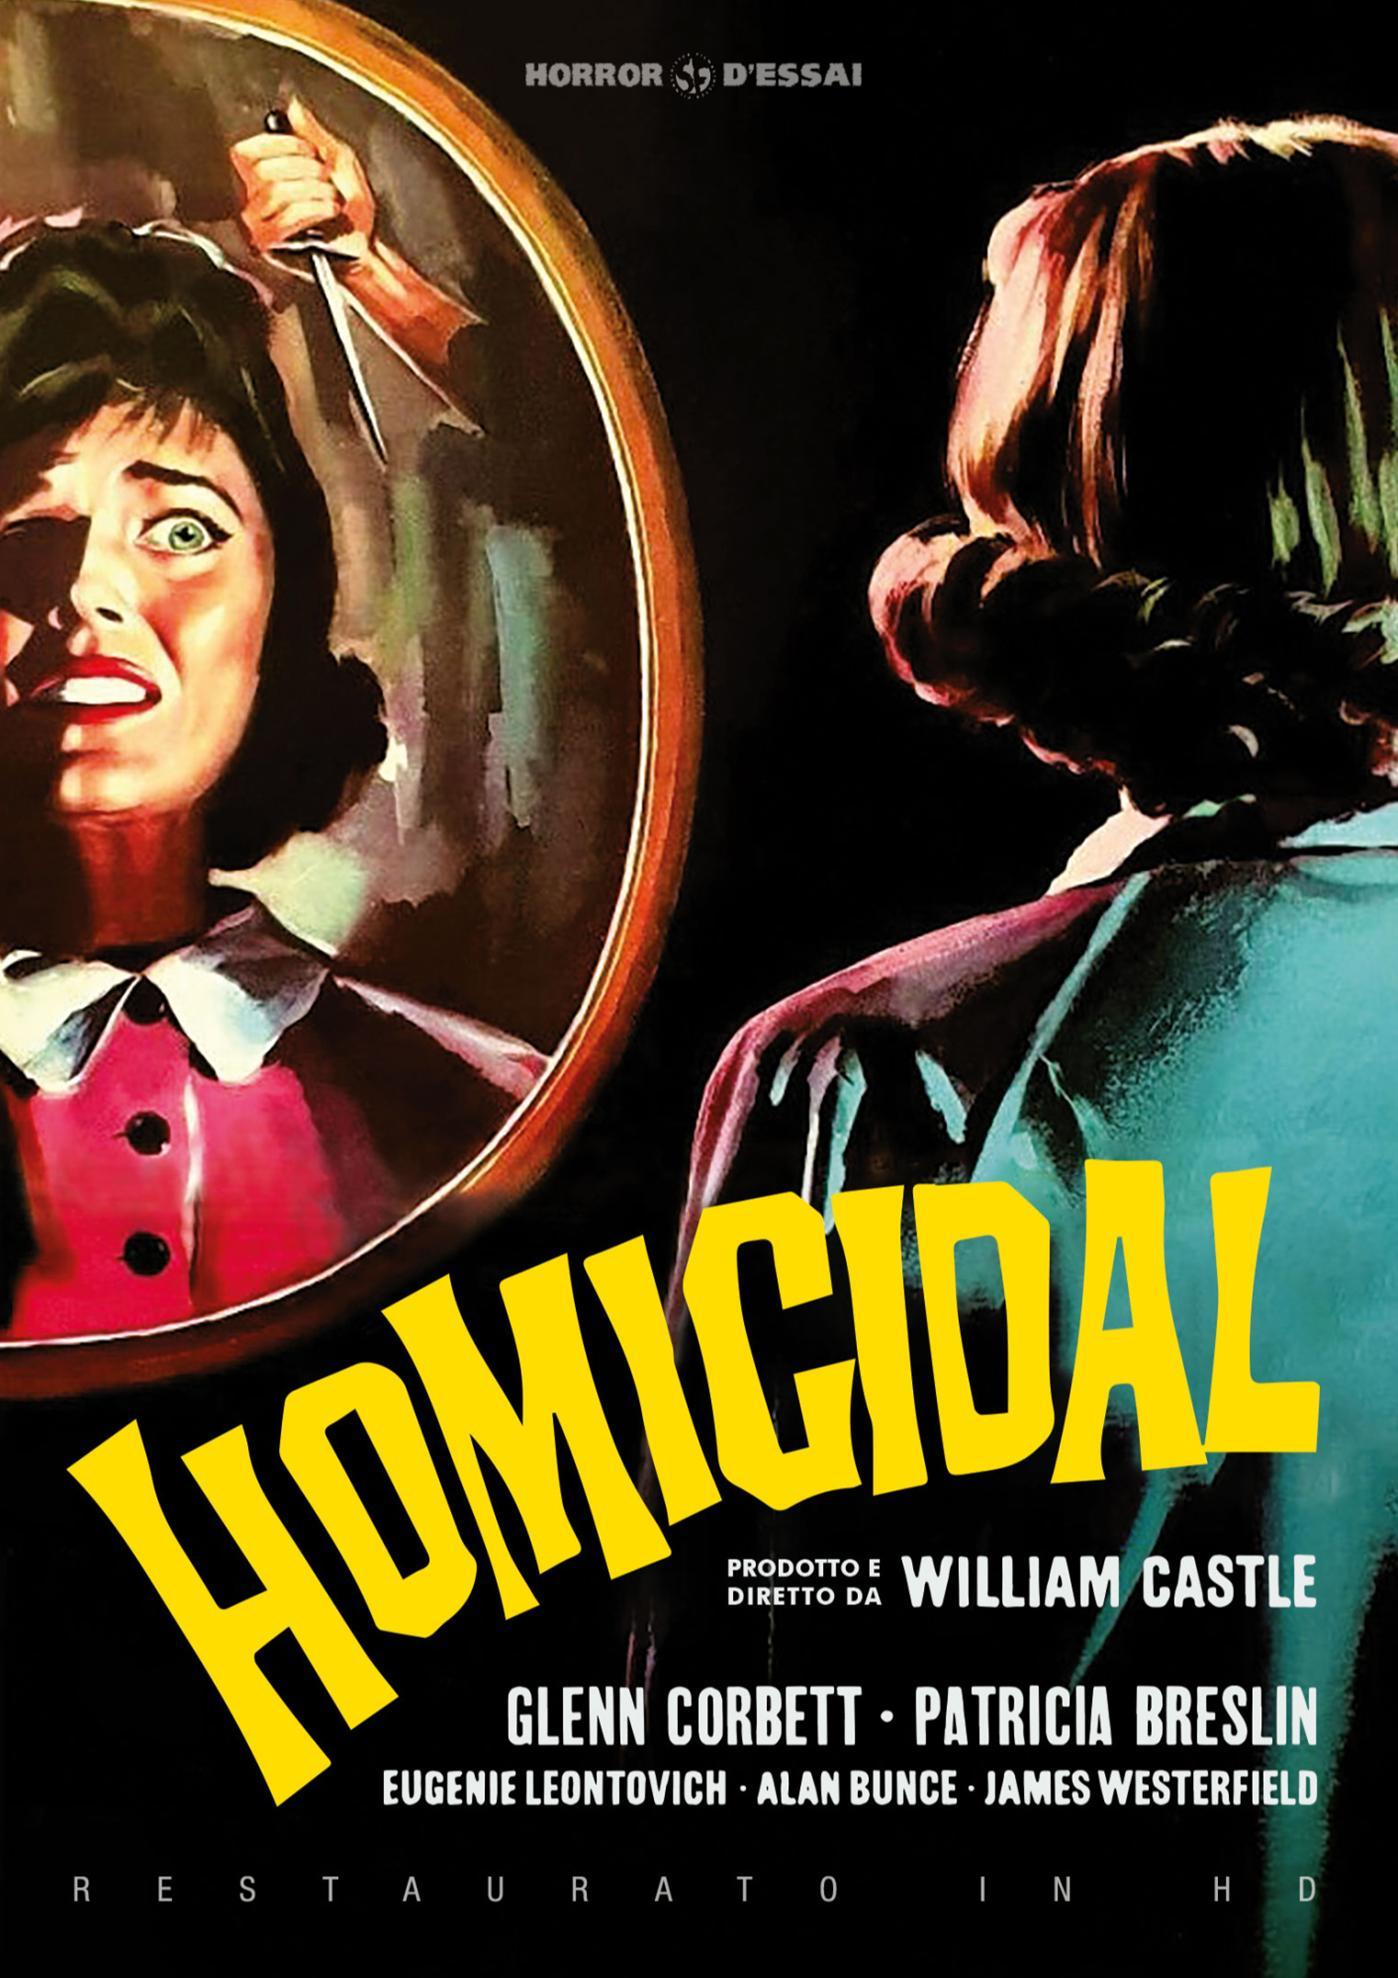 HOMICIDAL (RESTAURATO IN HD) (DVD)